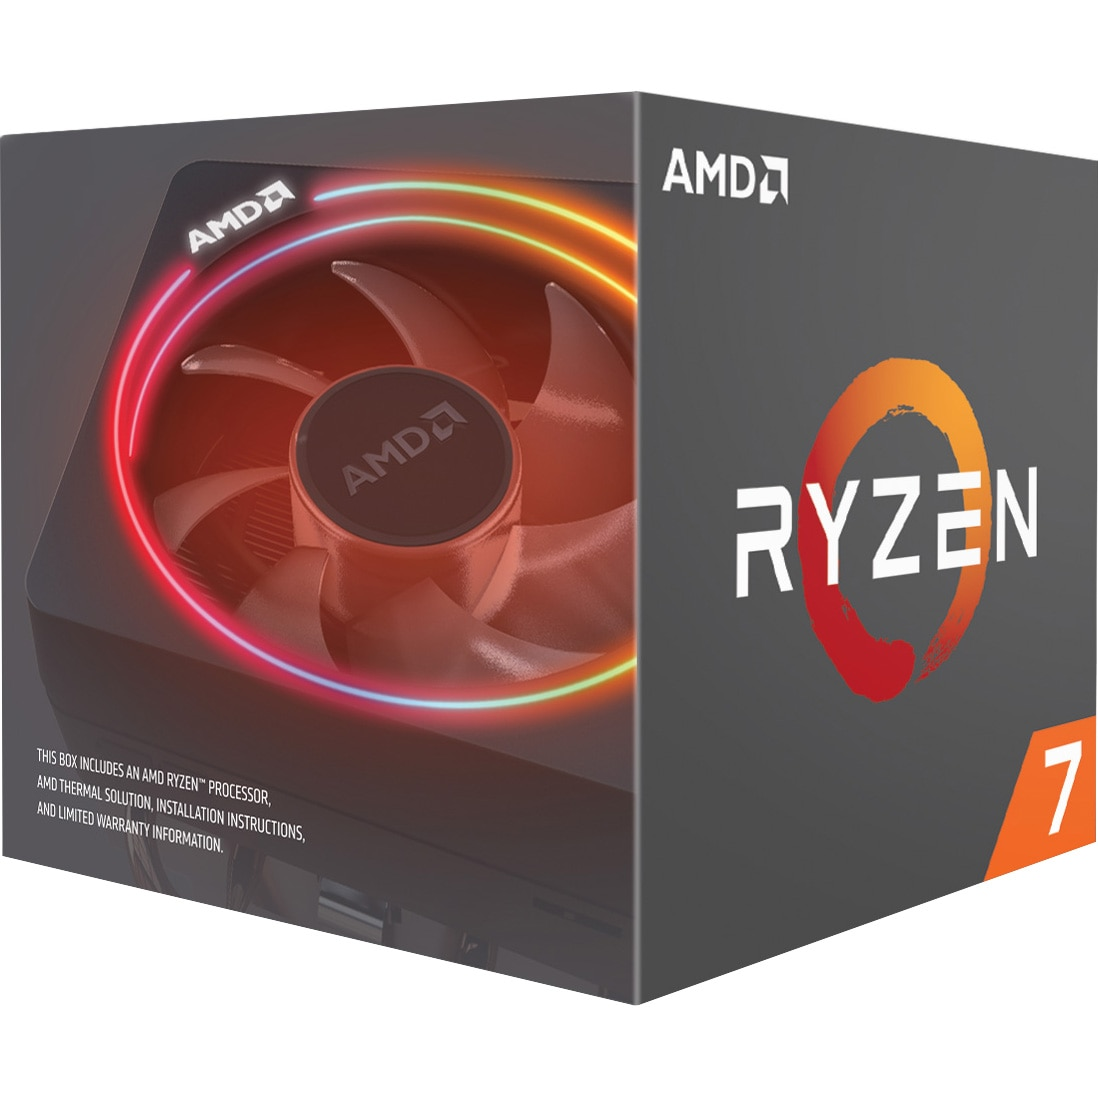 Fotografie Procesor AMD Ryzen 2700X, 4.3GHz, 20MB, Socket AM4, Wraith Prism cooler